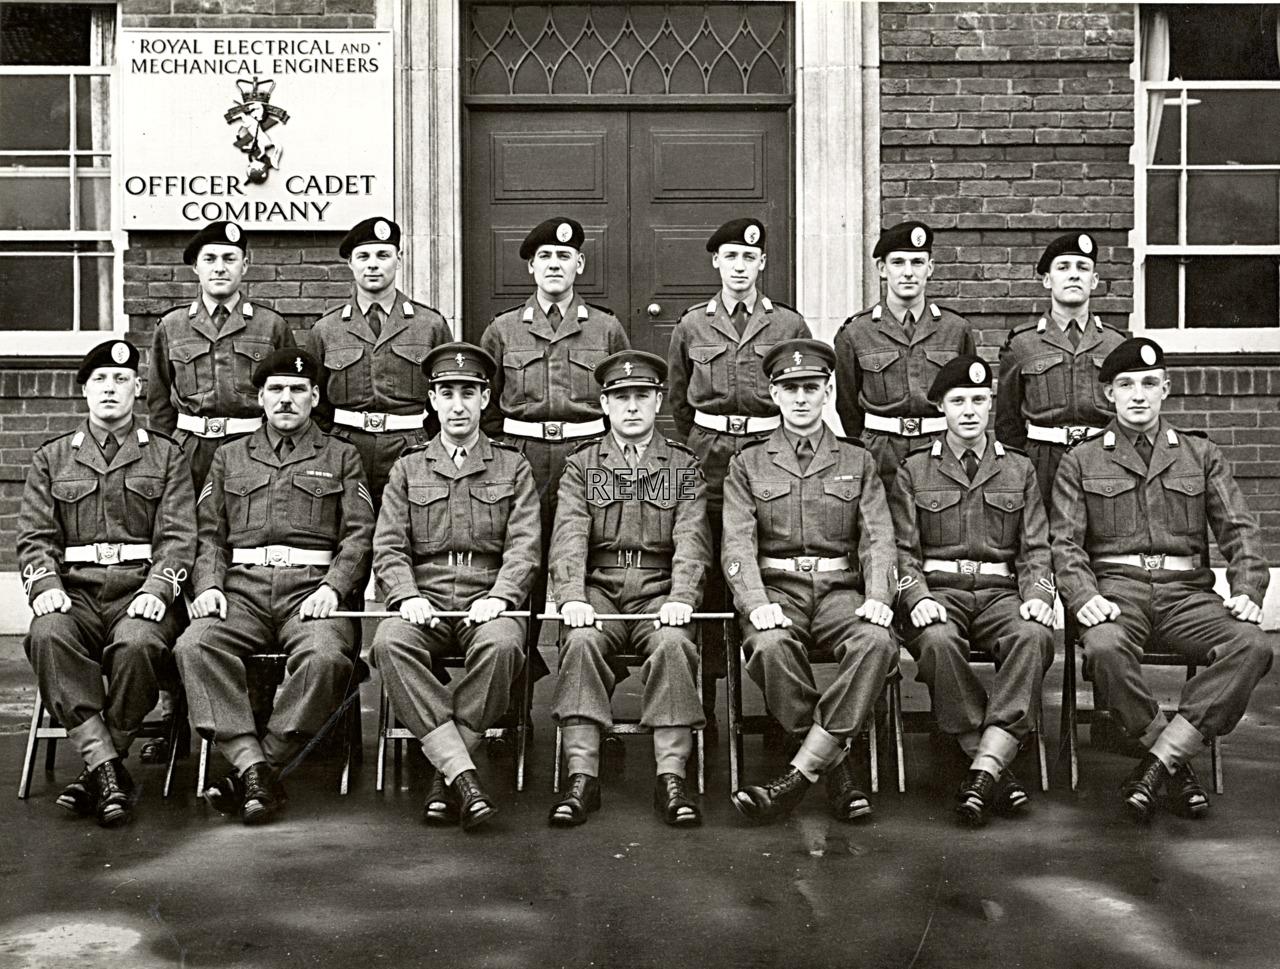 No 56 Cadet Officer General Course, Bordon: January 1958